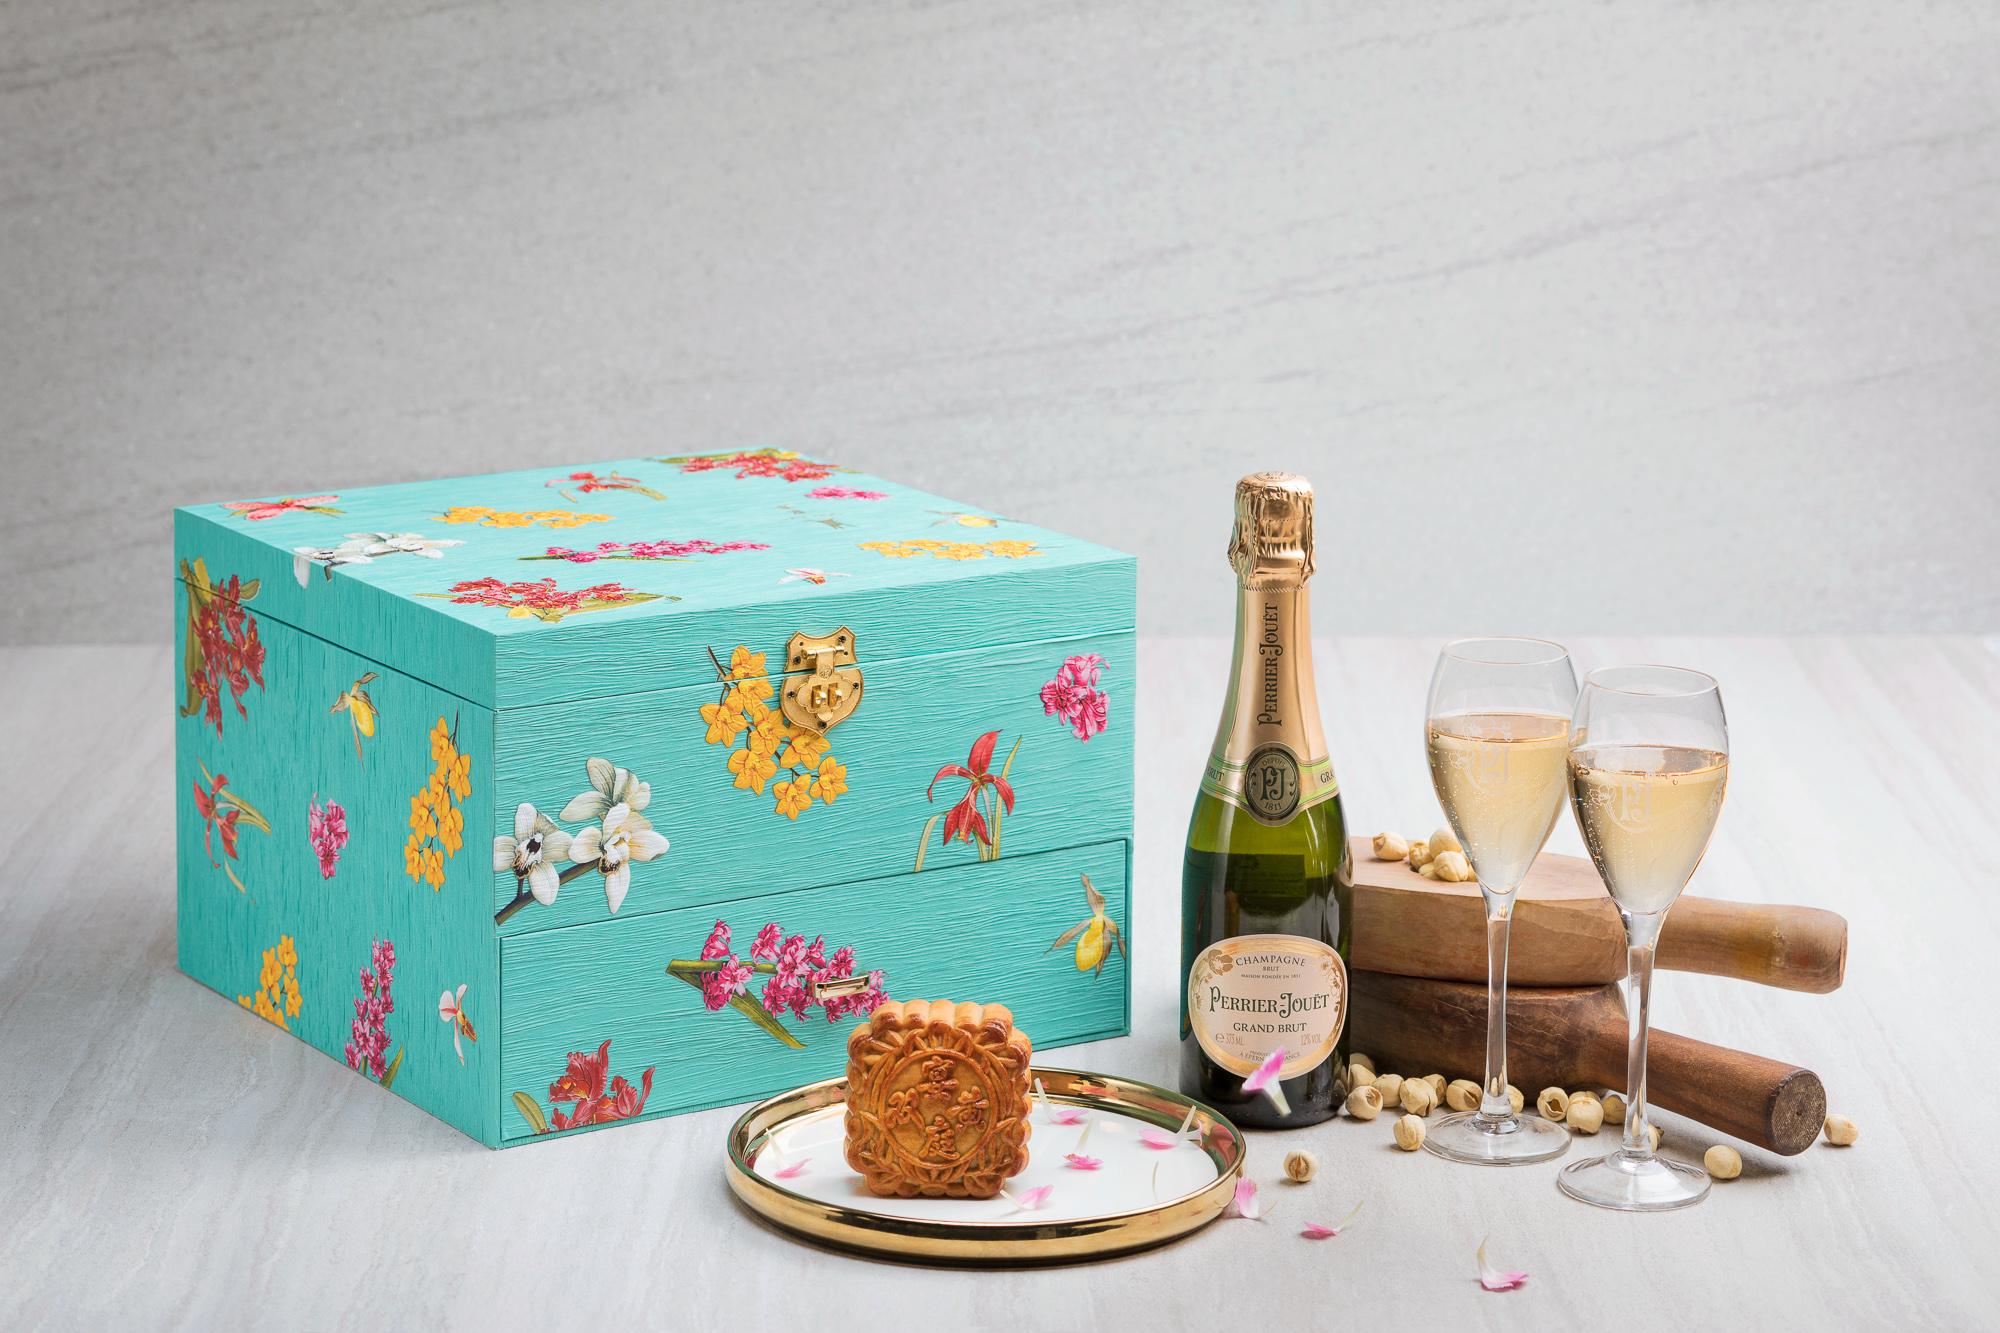 Mid-Autumn-2017-at-Yan-Ting-The-St.-Regis-Singapore-Lavish-Mooncake-Gift-Box-2.jpg